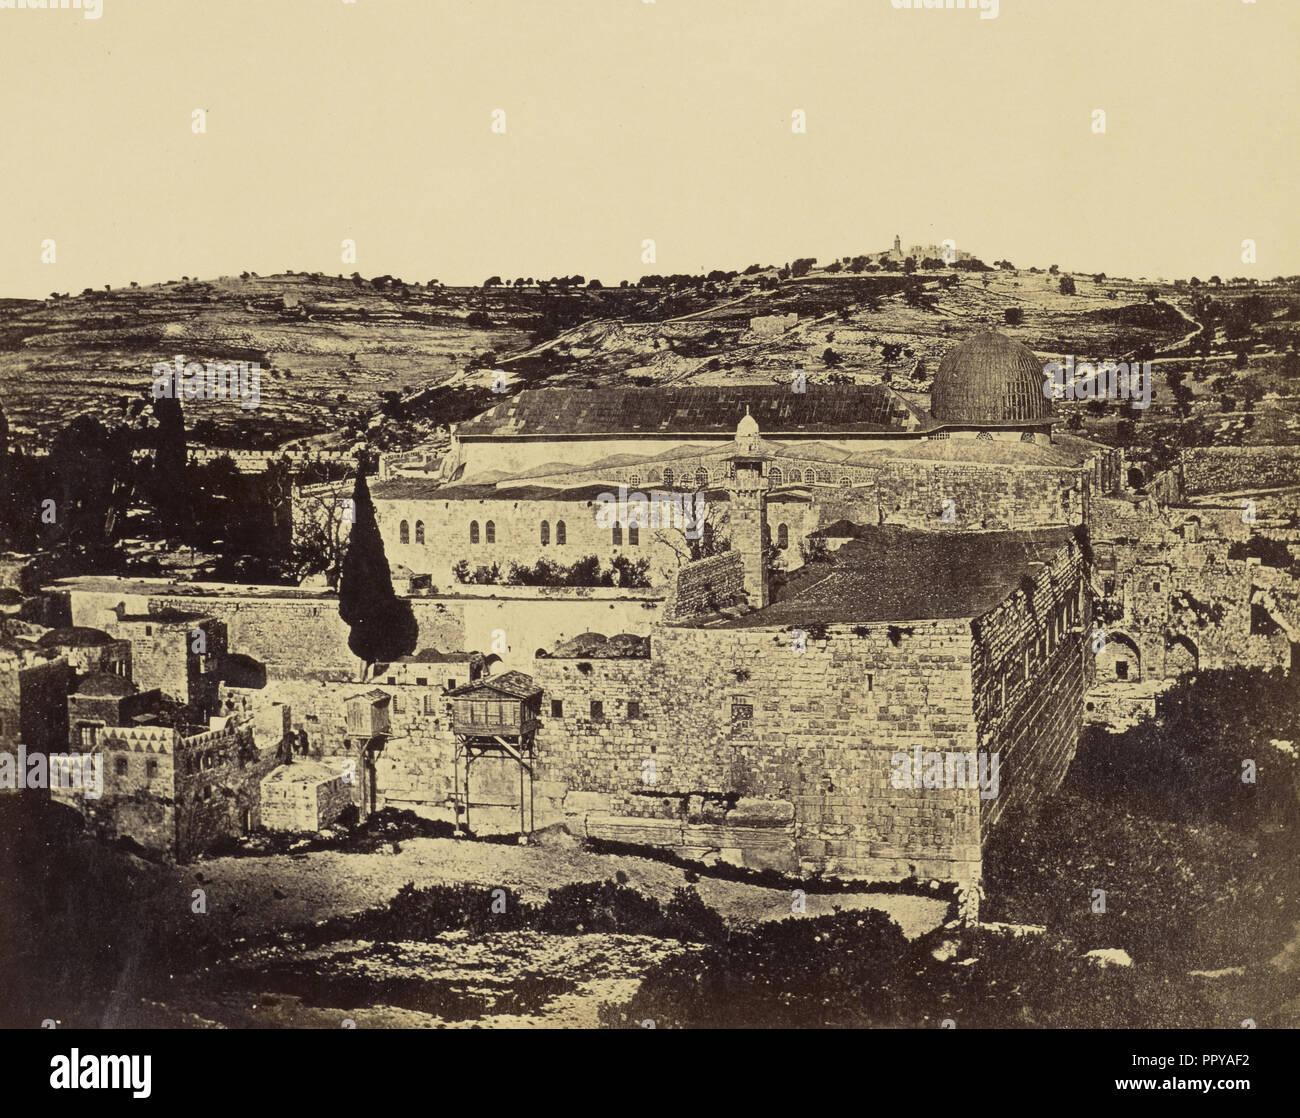 The Mosk, sic, el-Aska, Solomon's Gate; James Robertson, English, 1813 - 1888, Felice Beato, 1832 - 1909 - Stock Image